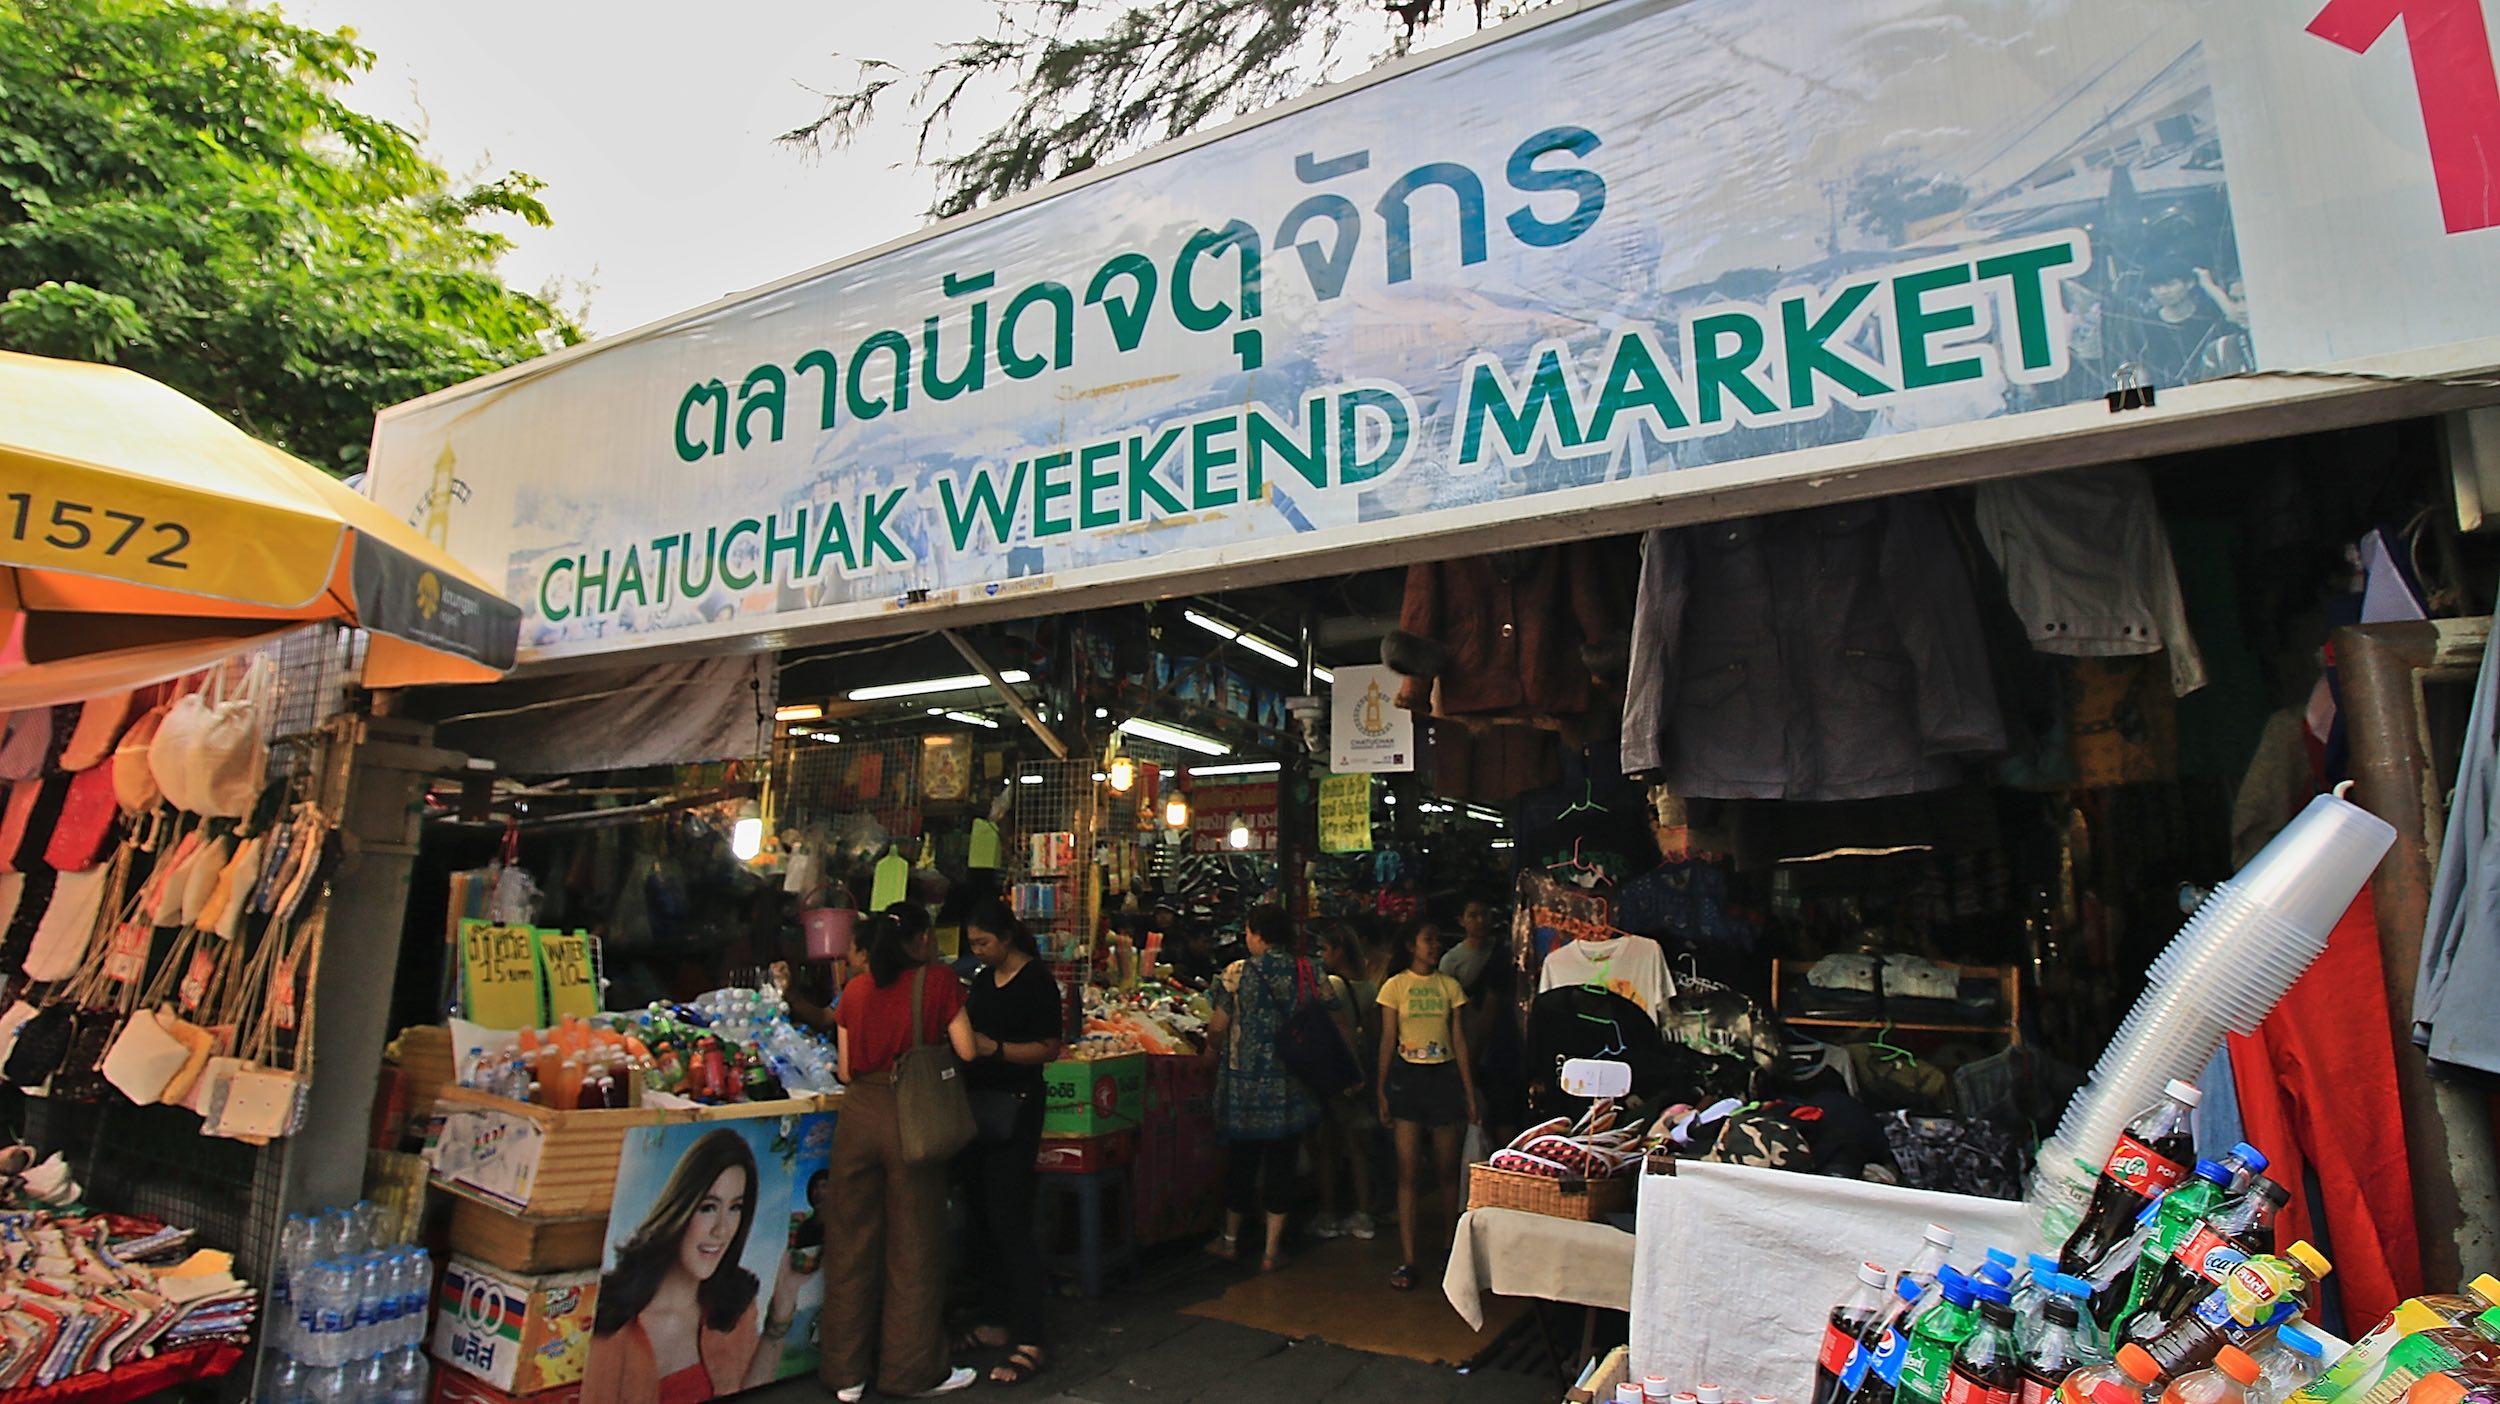 Chatuchak_Weekend_Market_Bangkok_Market_Sign.jpg